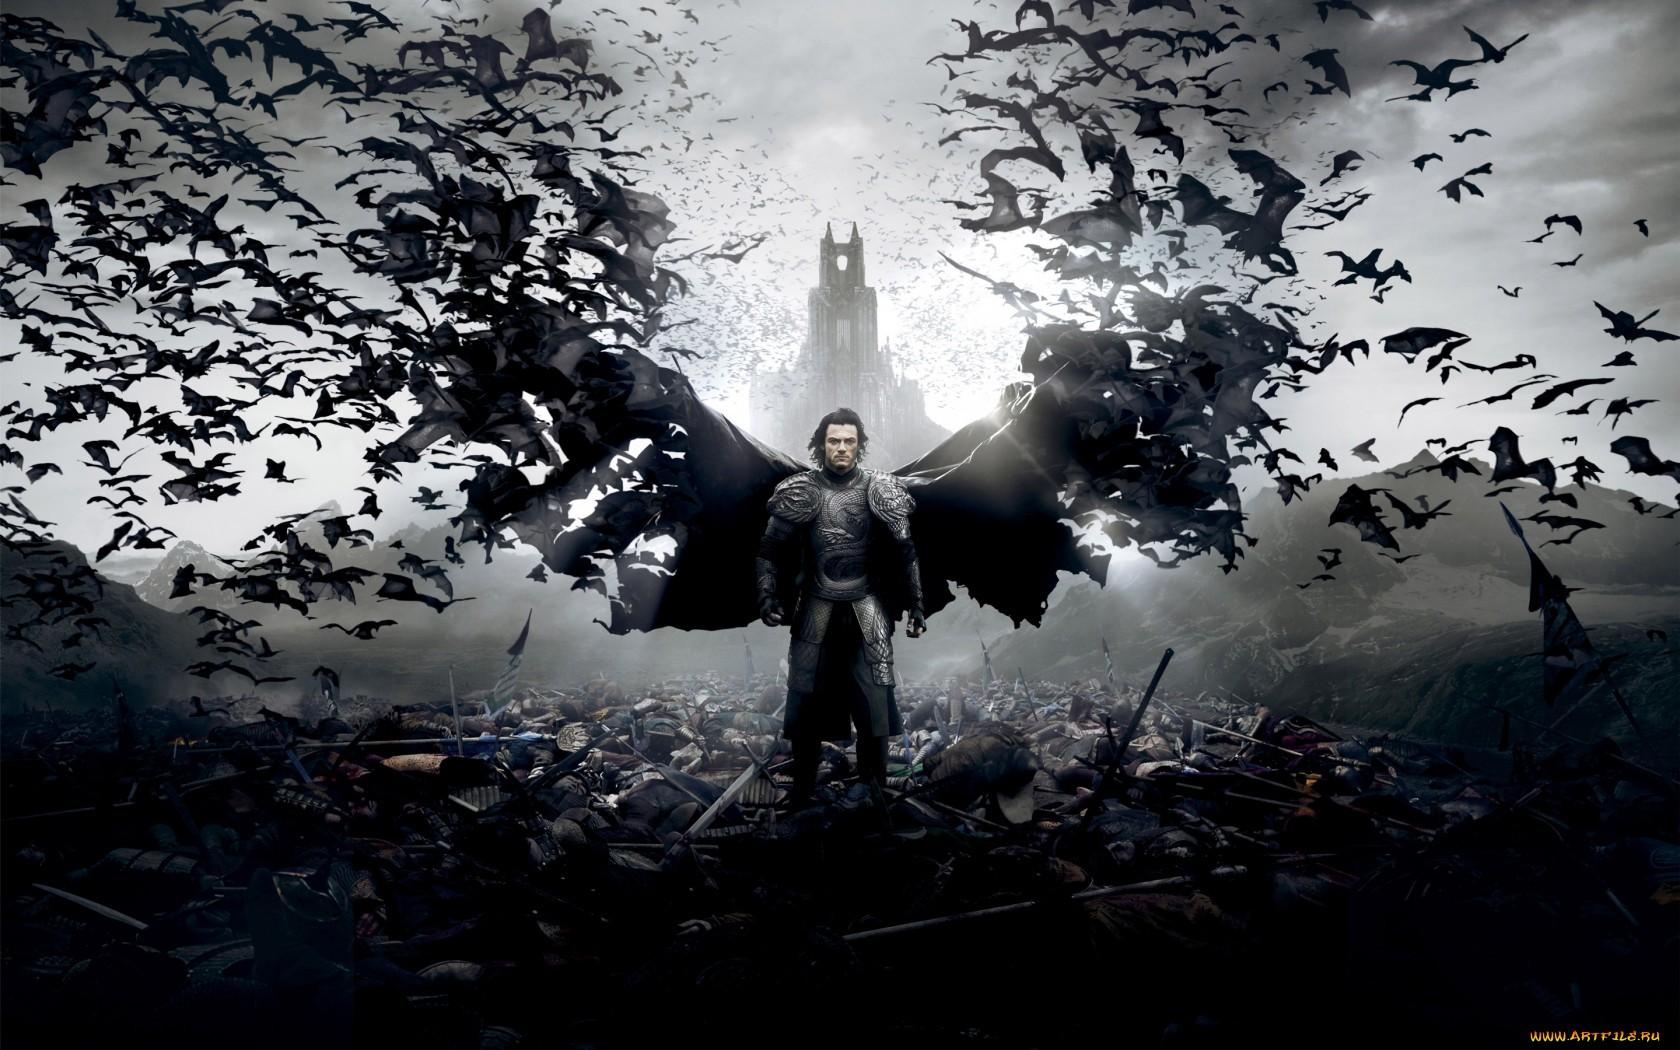 digital art horror movies vampires bats Dracula Untold Dracula vlad tepes Vlad the Impaler darkness screenshot